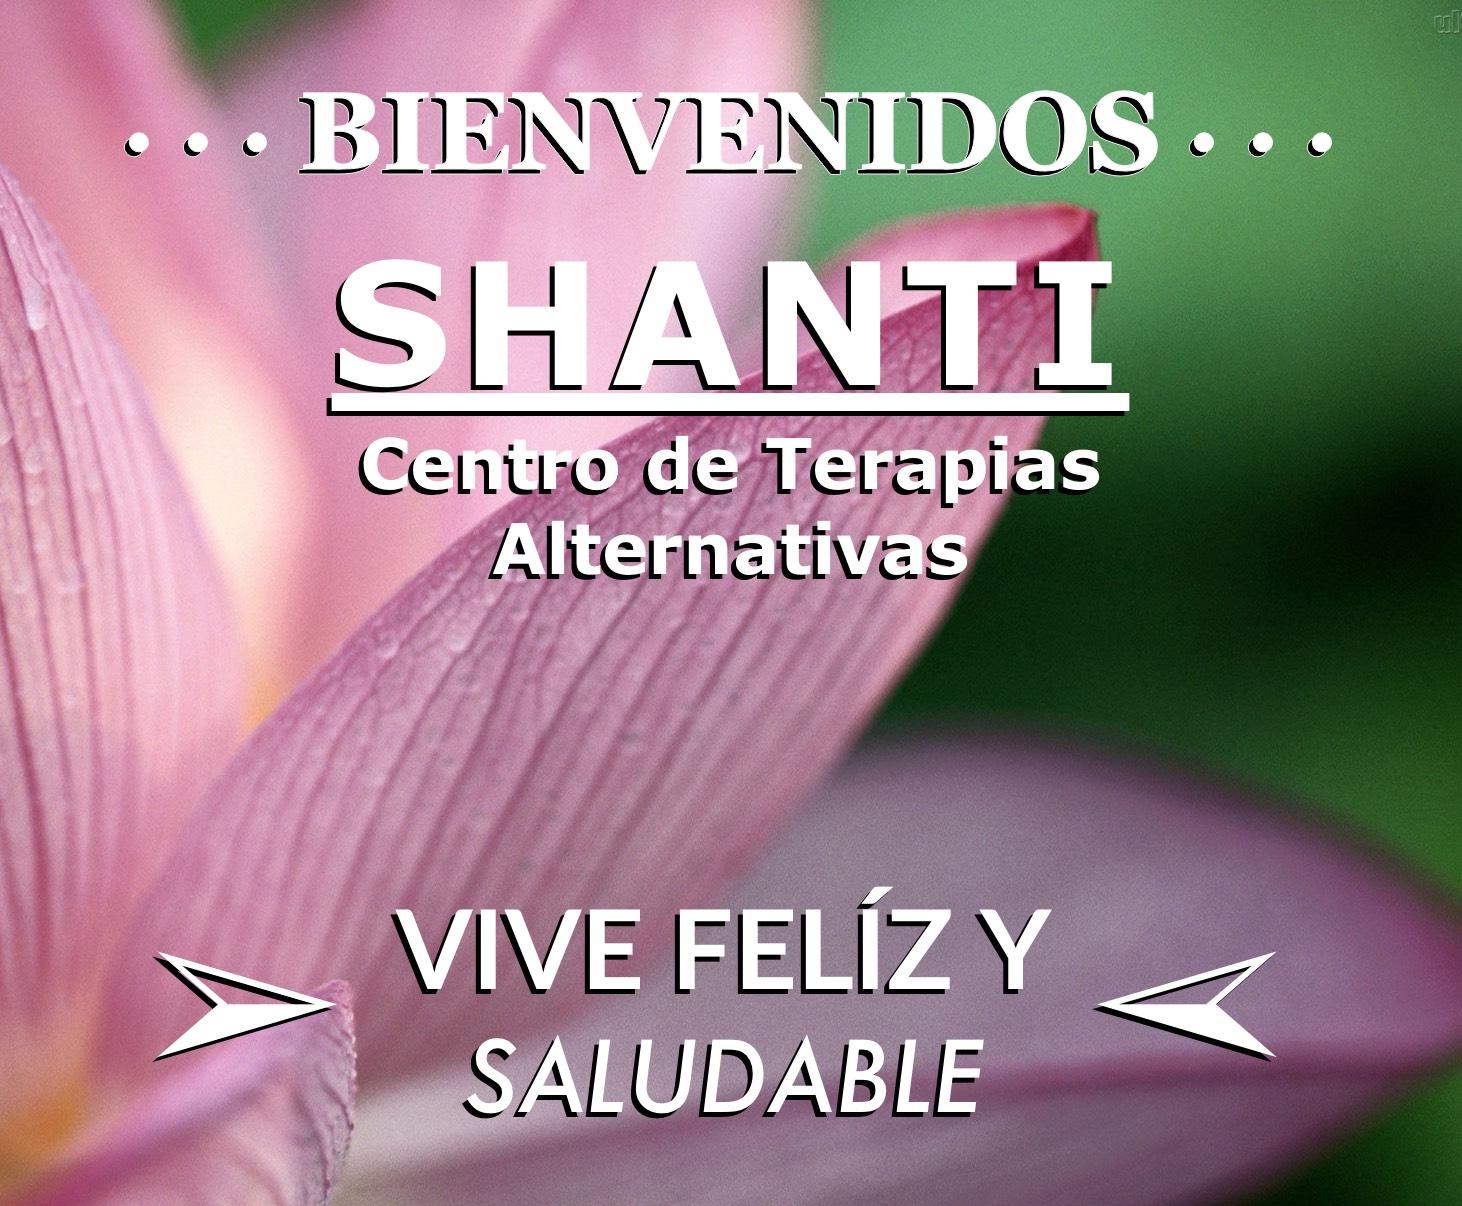 Shanti Centro De Terapias Alternativas